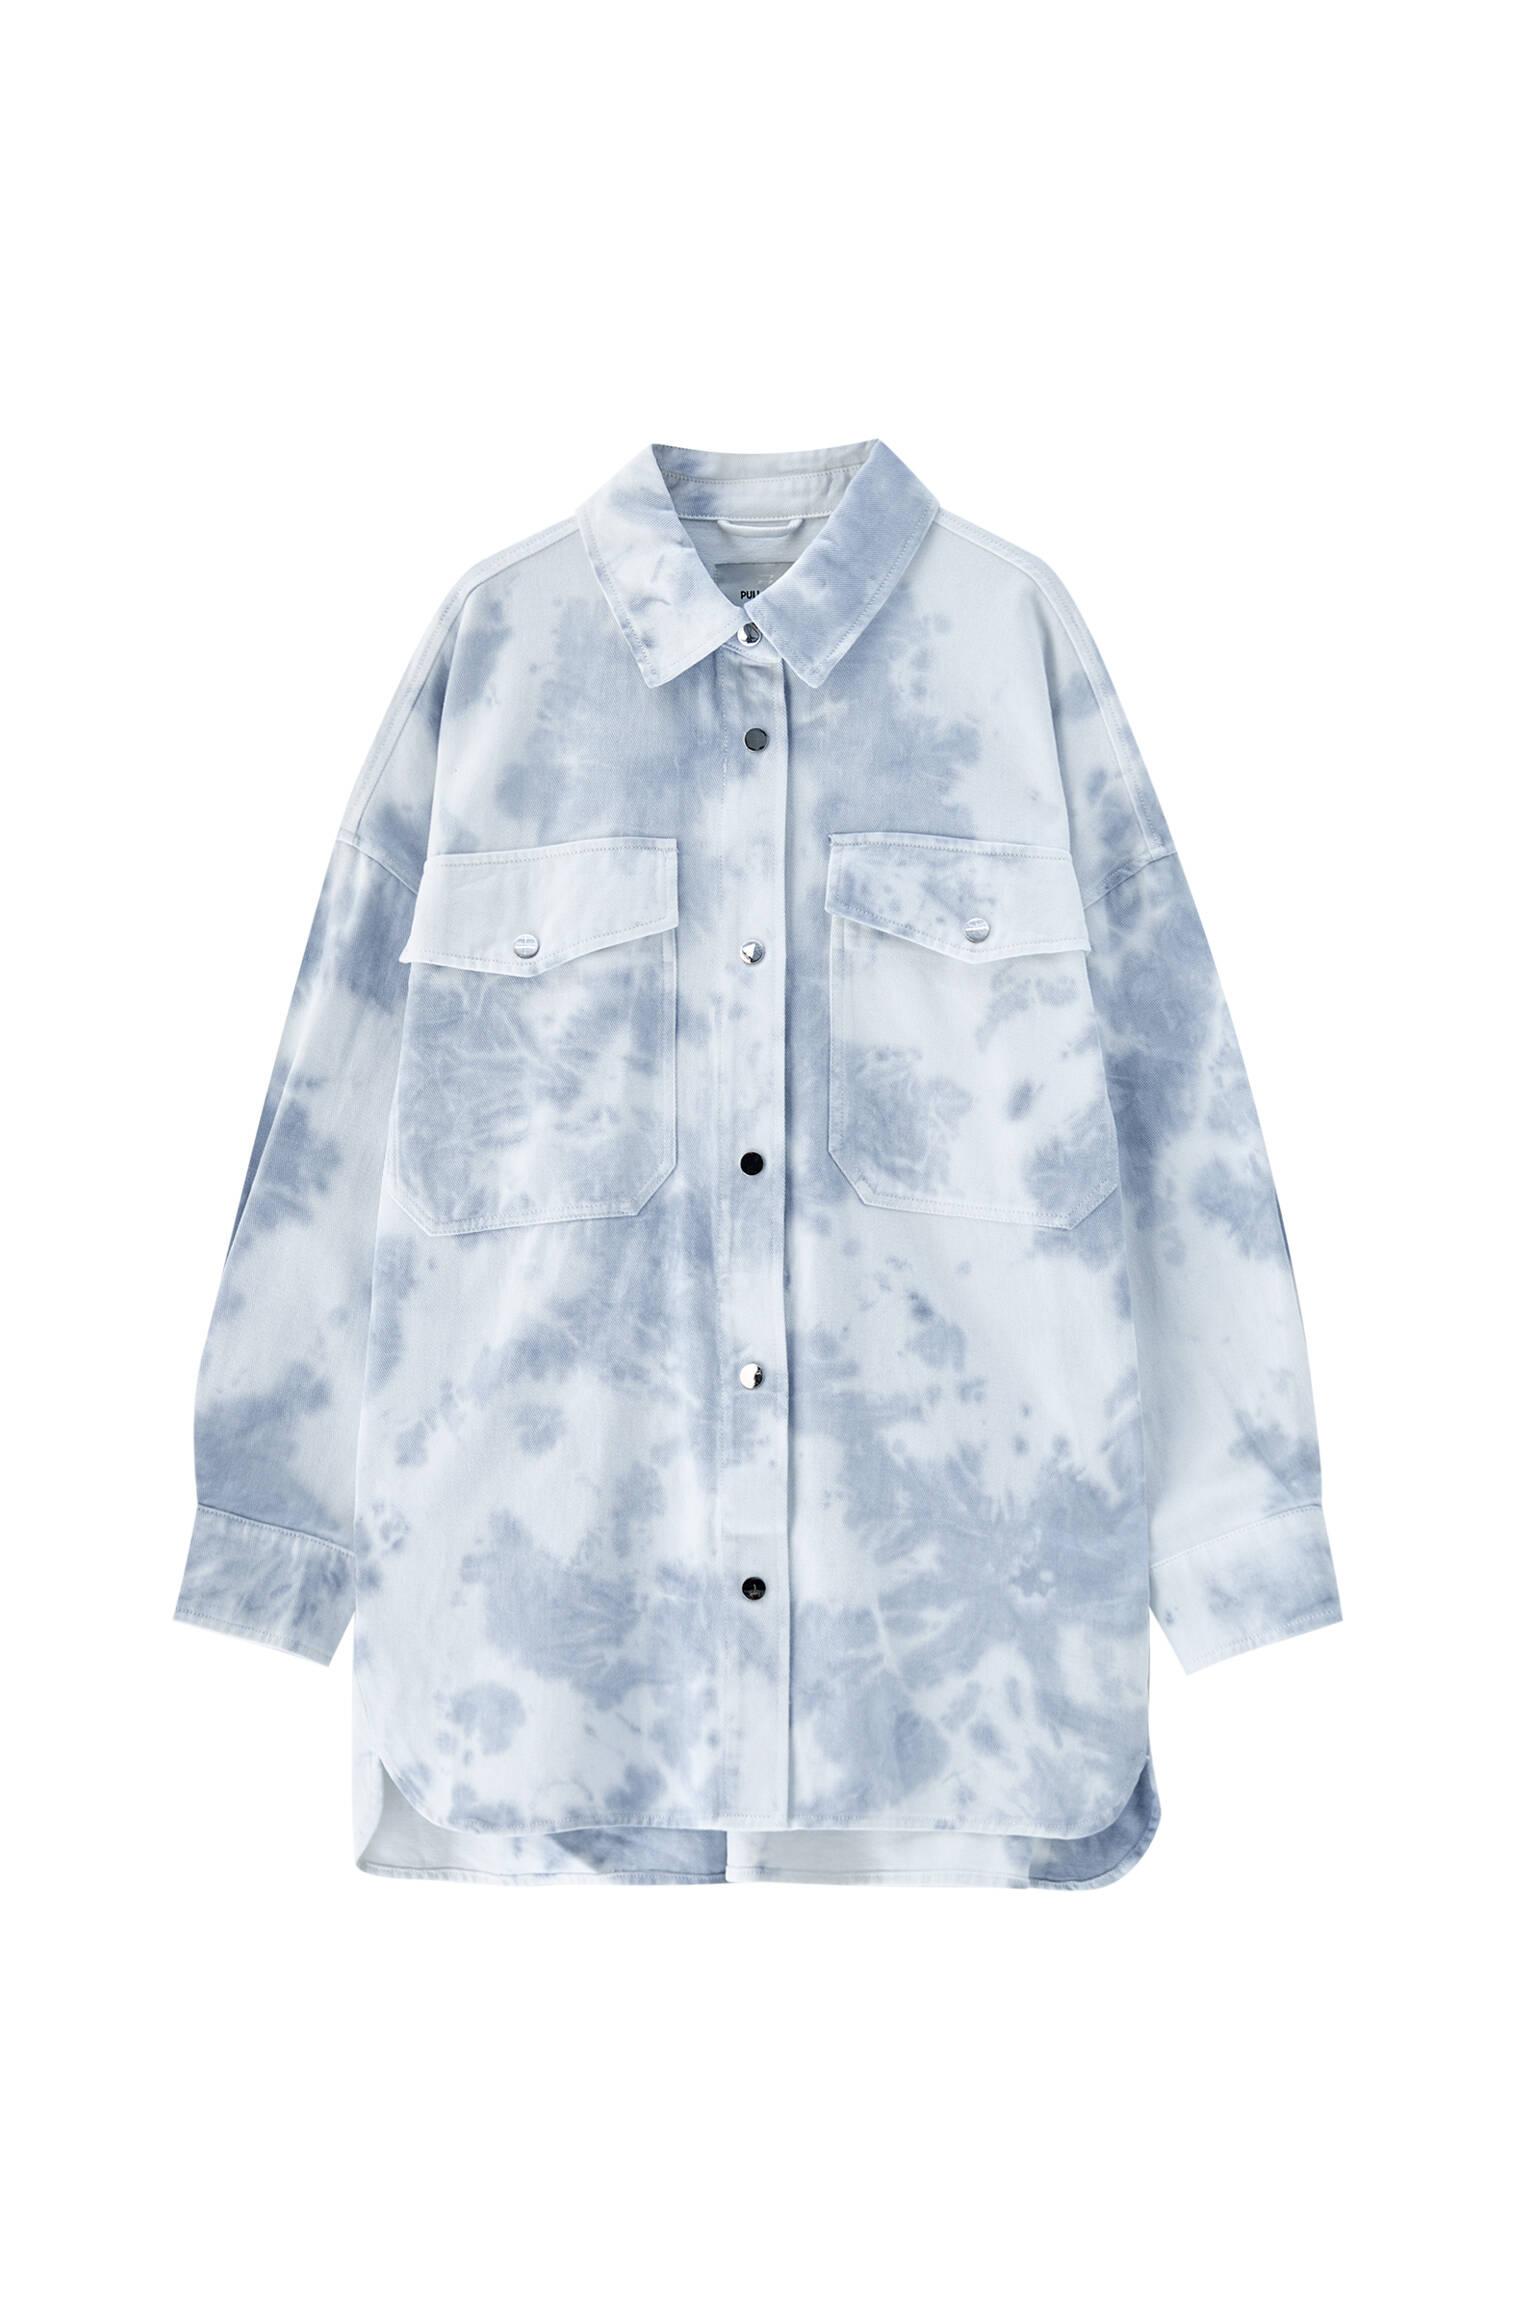 0-044 Куртка-рубашка с принтом тай-дай и передними карманами Pull & Bear